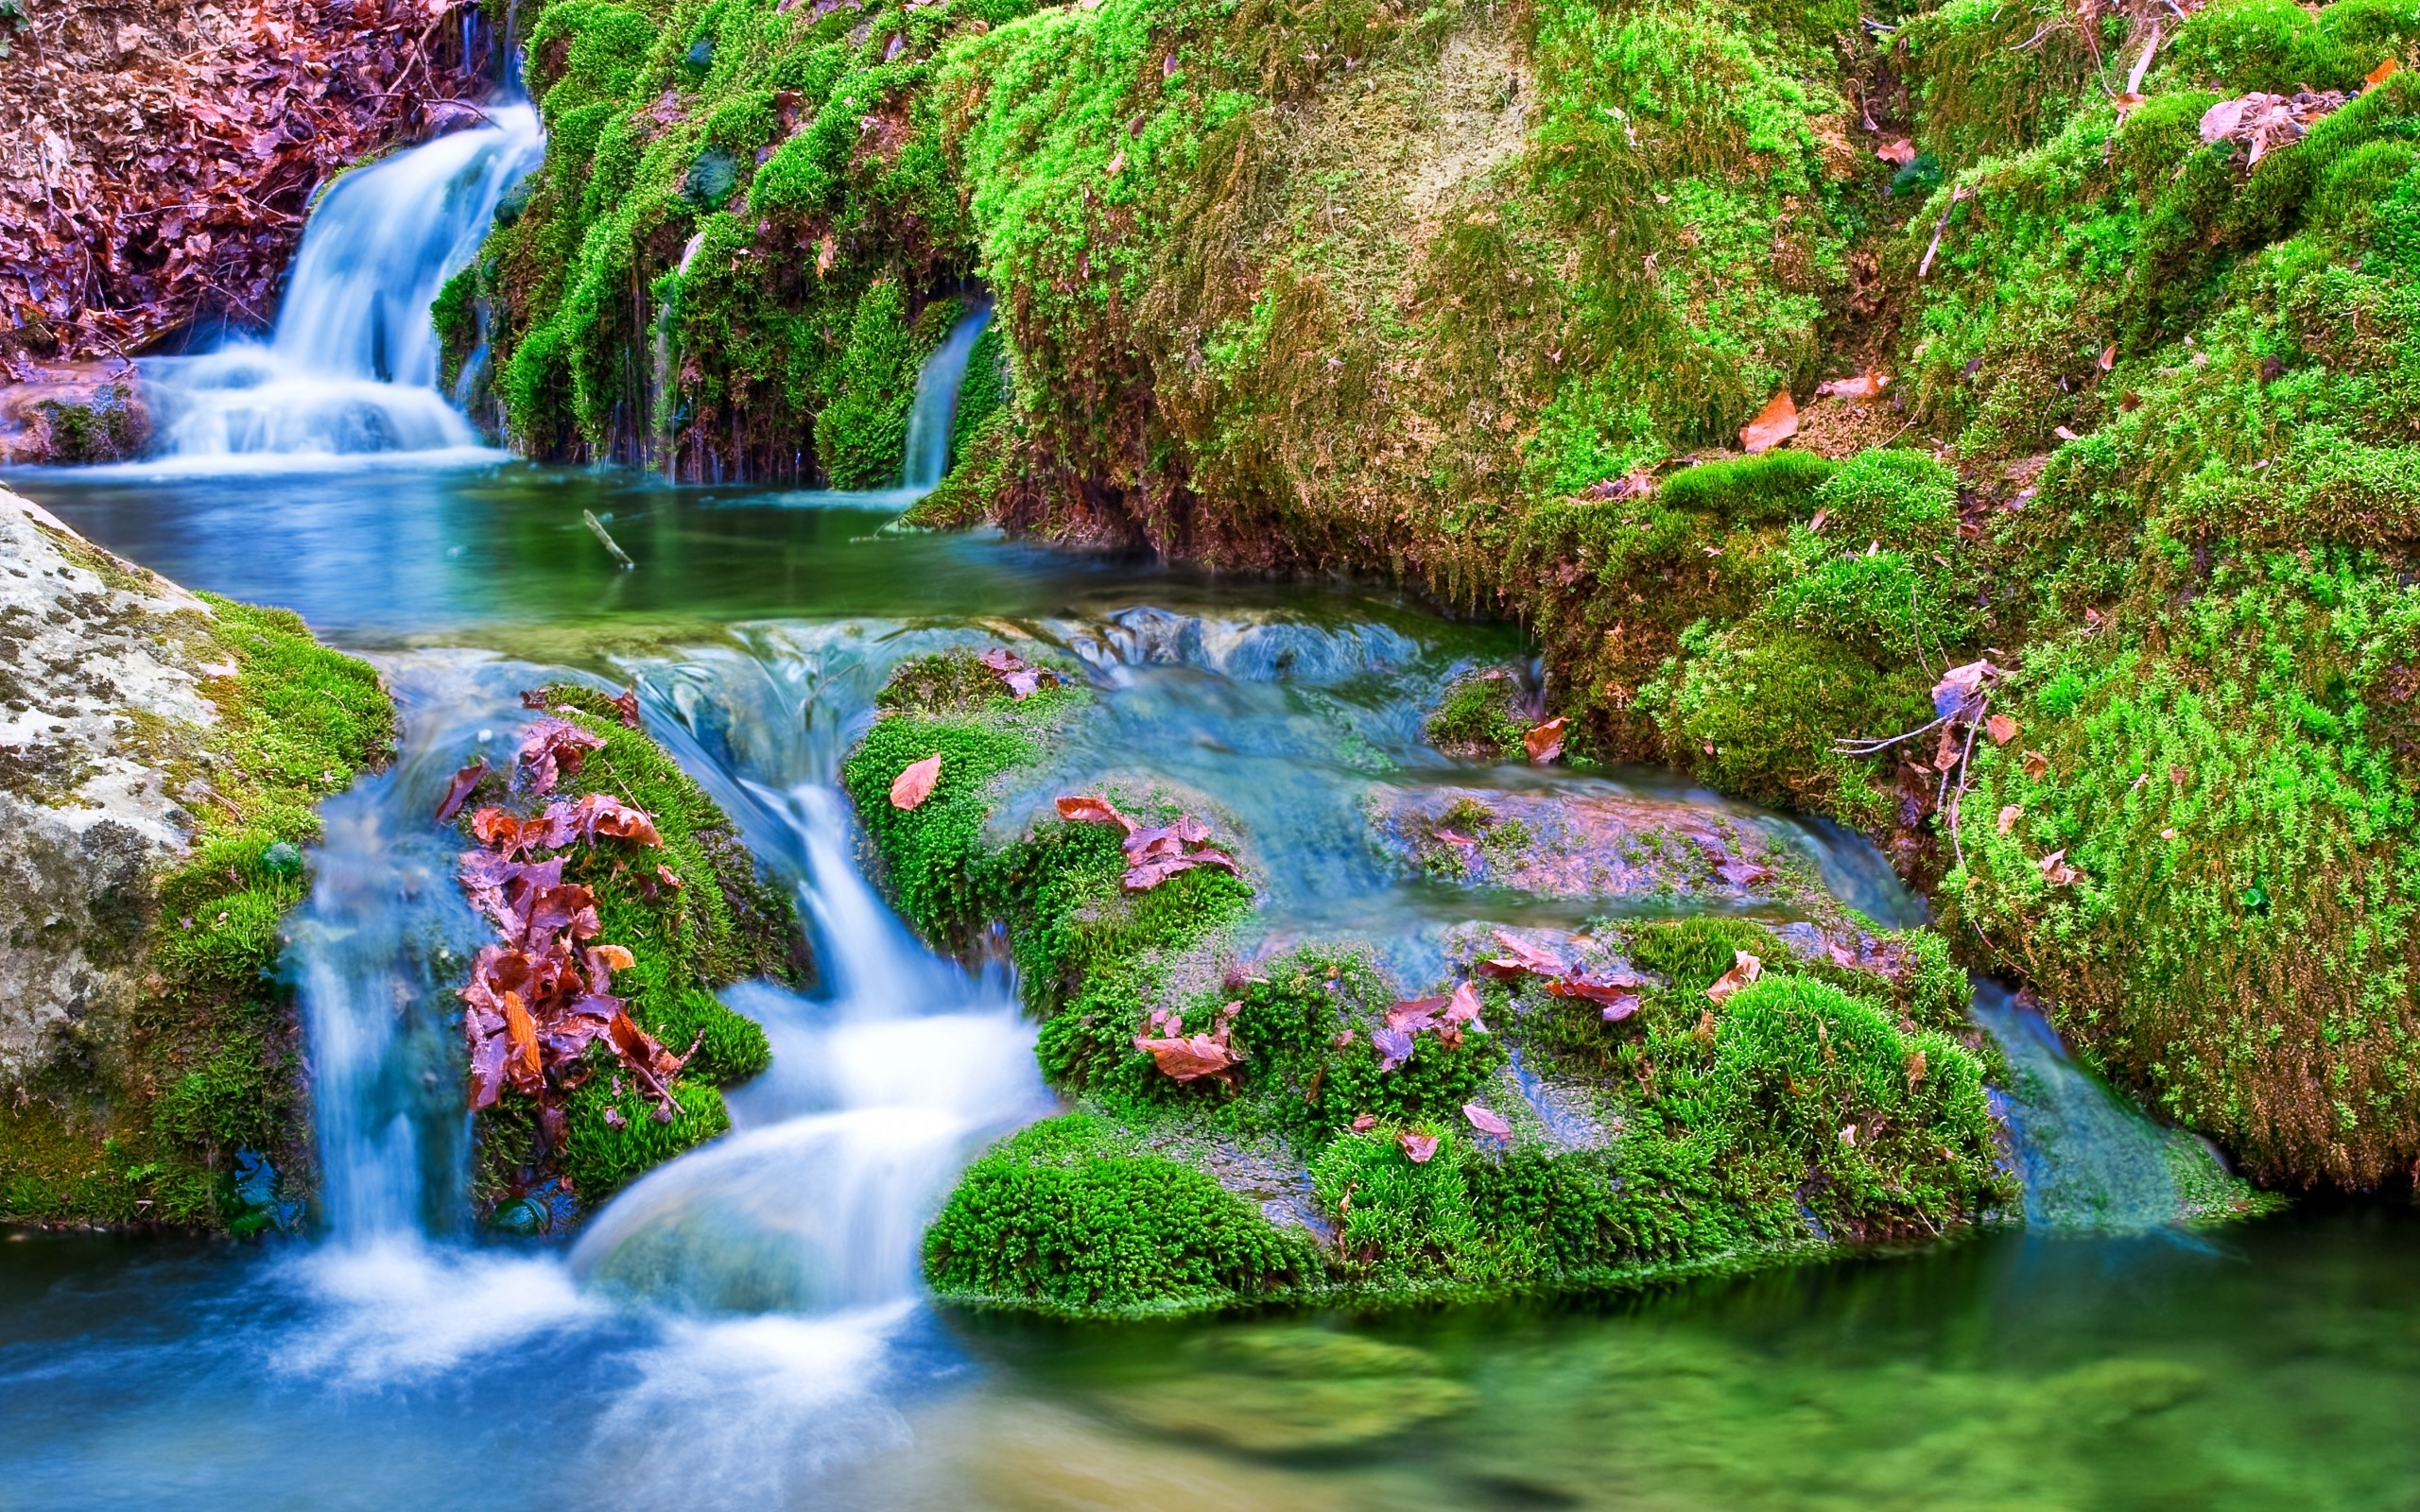 Live Niagara Falls Wallpaper Hd Wallpaper Waterfall Download Pixelstalk Net